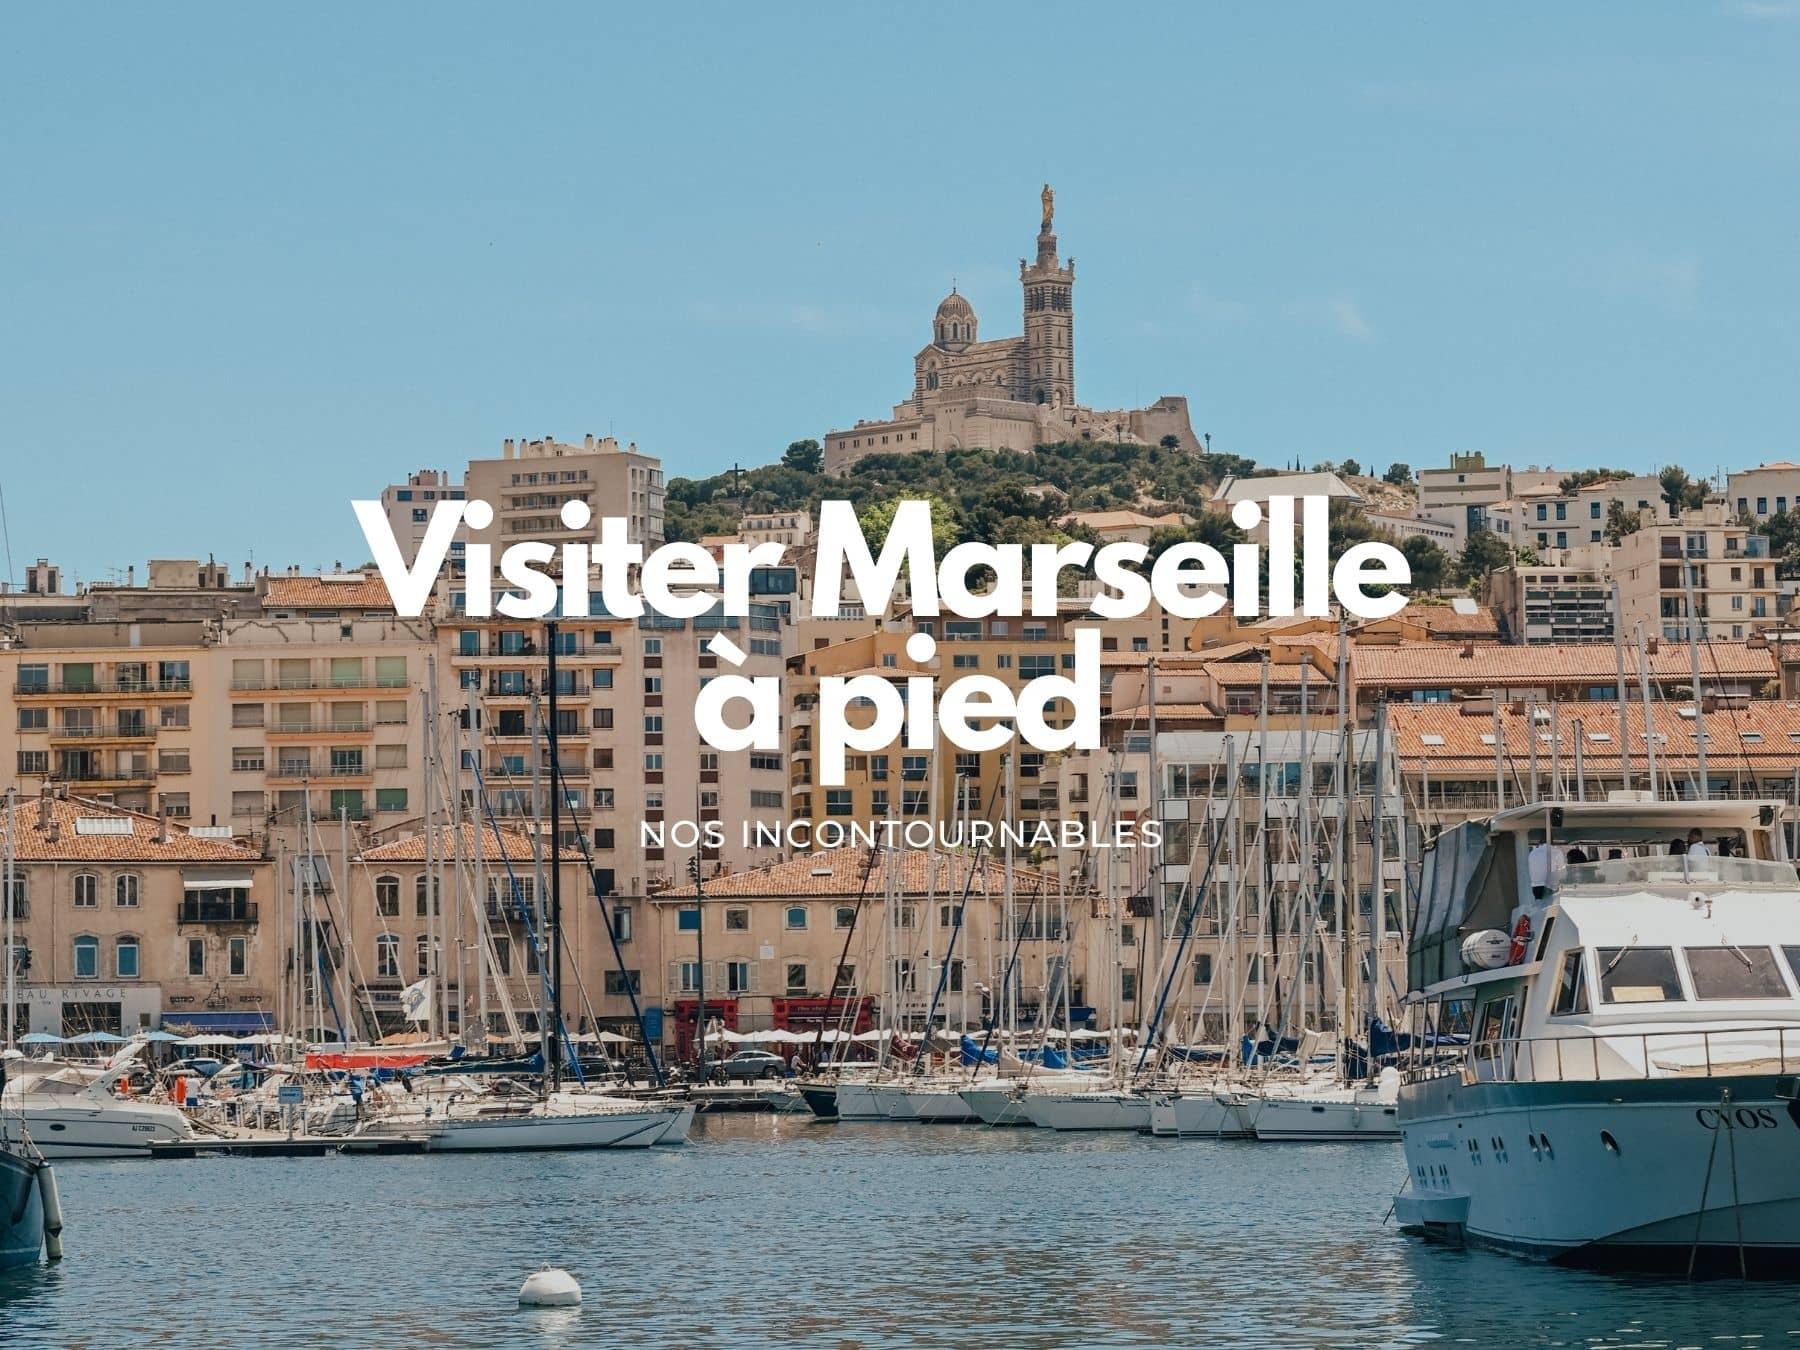 Visiter Marseille a pied